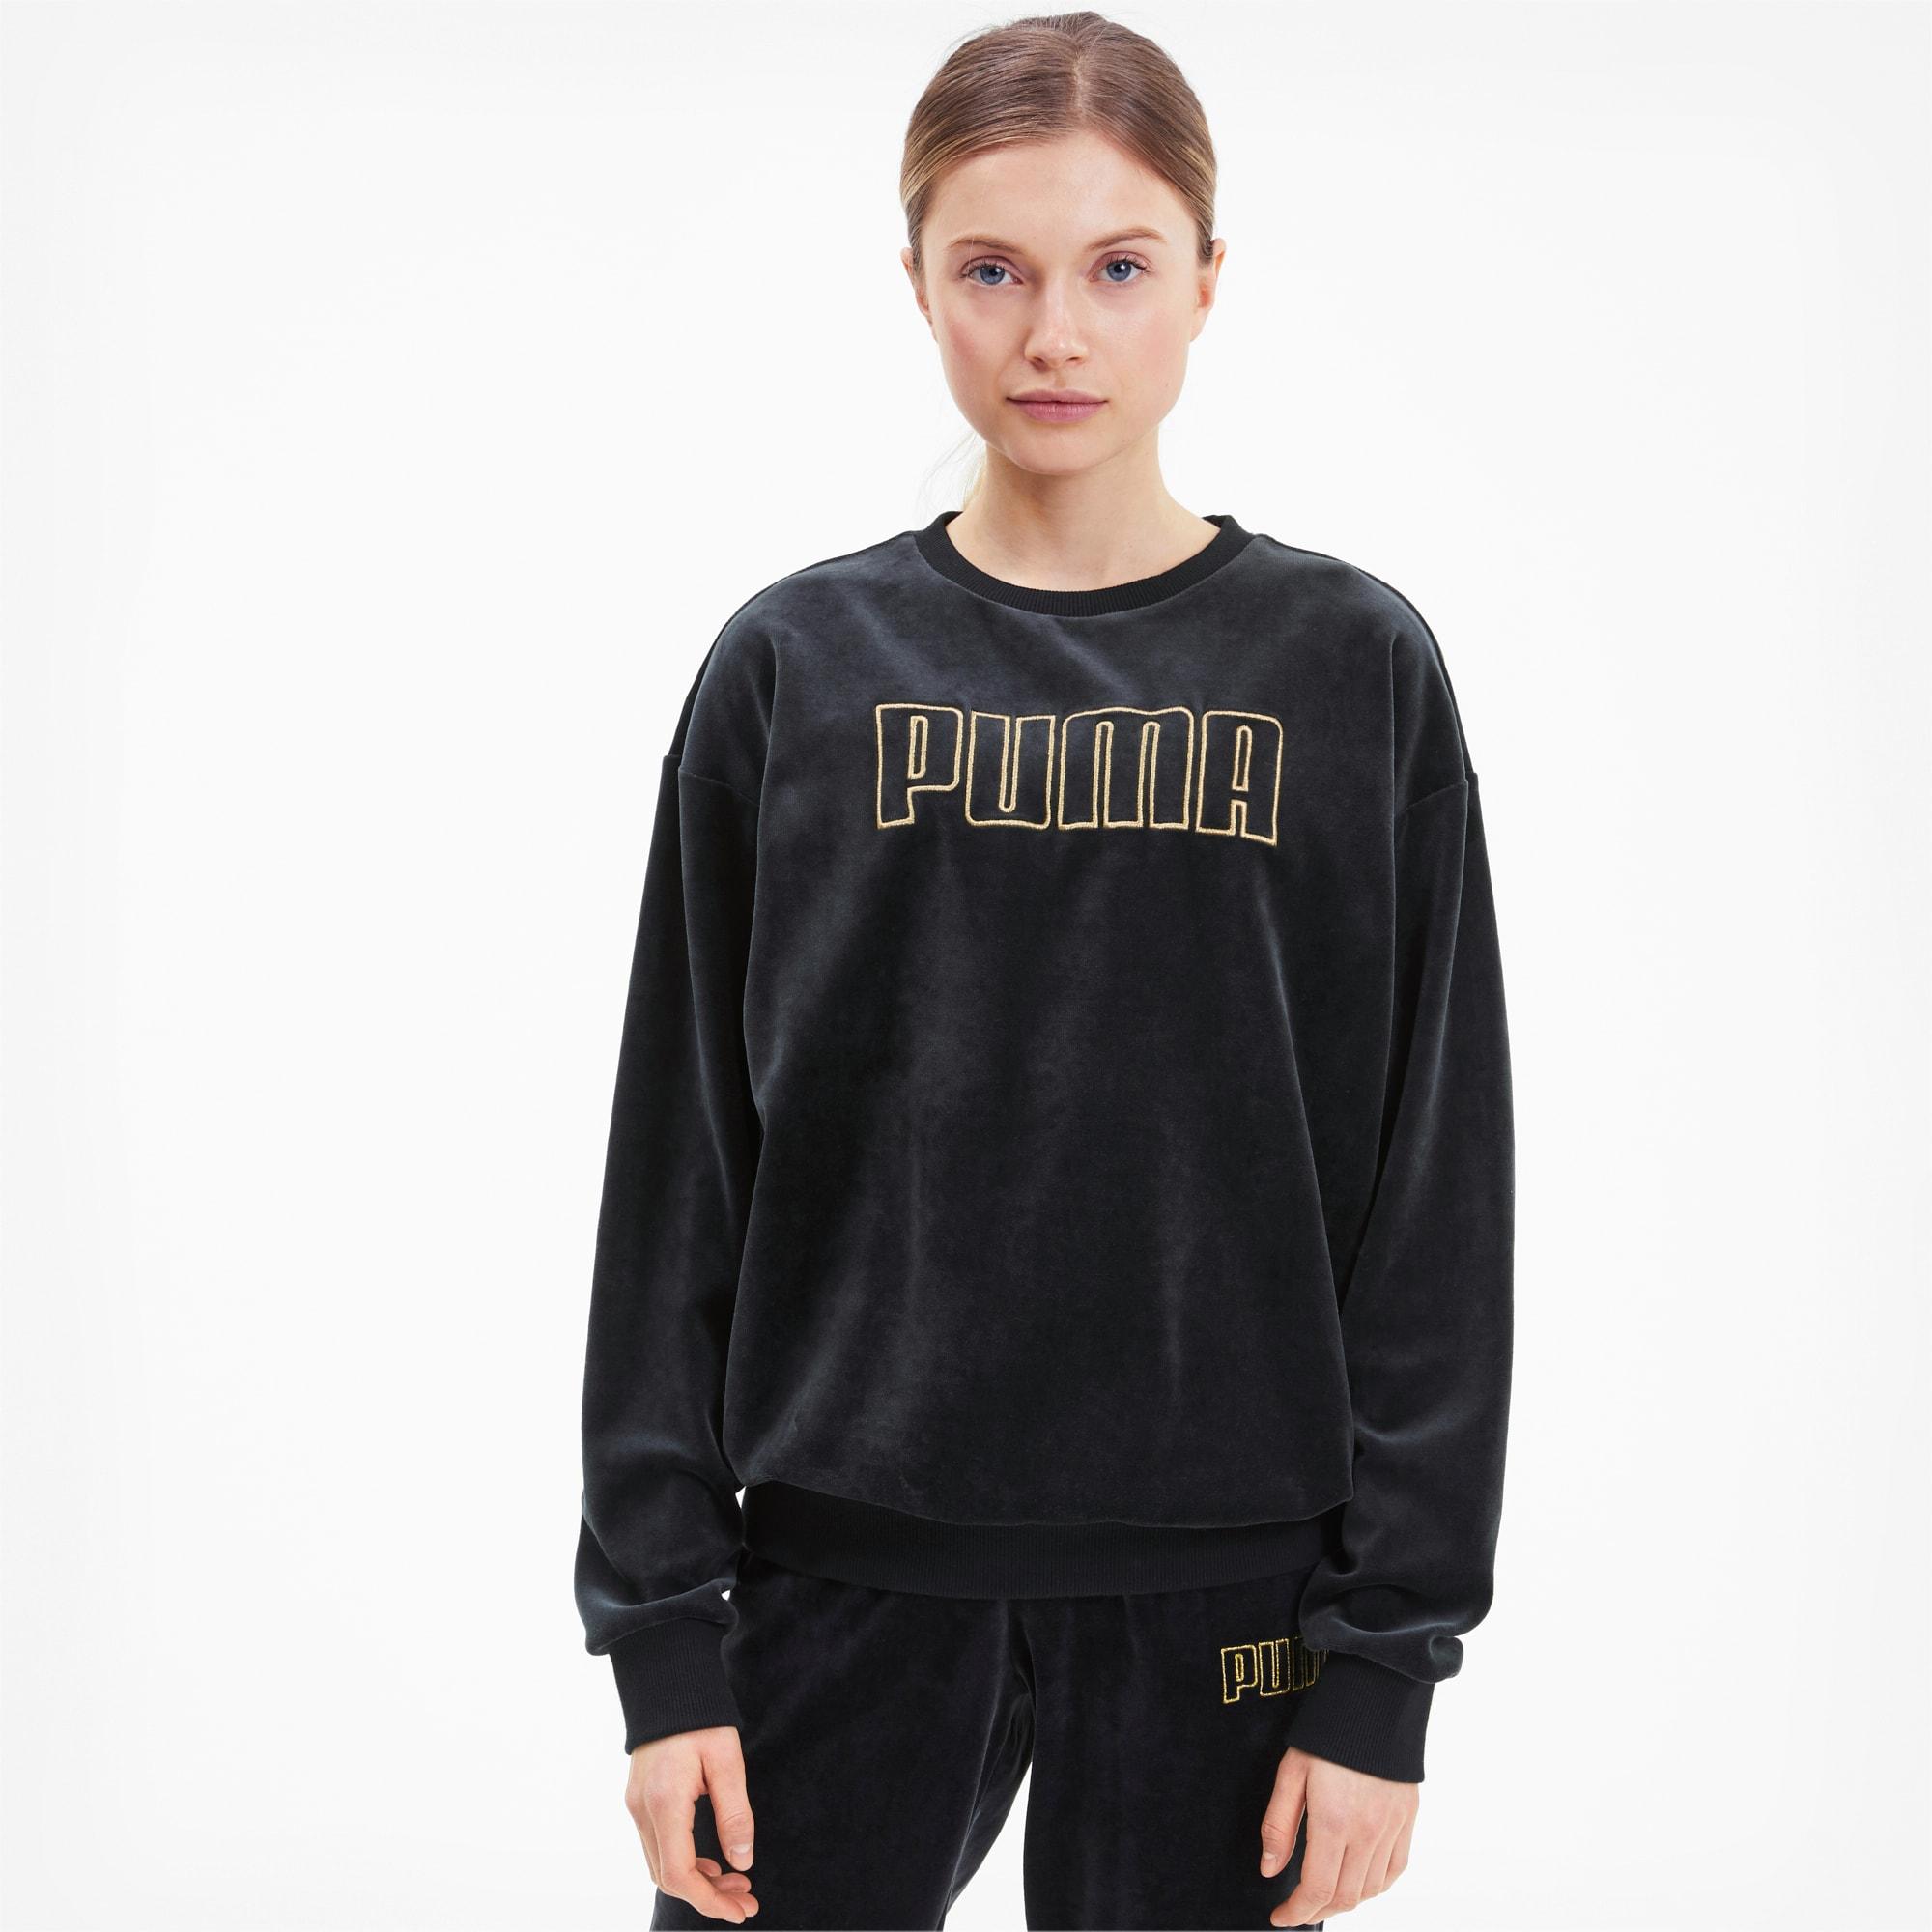 Modern Basics Women's Velour Crewneck Sweatshirt